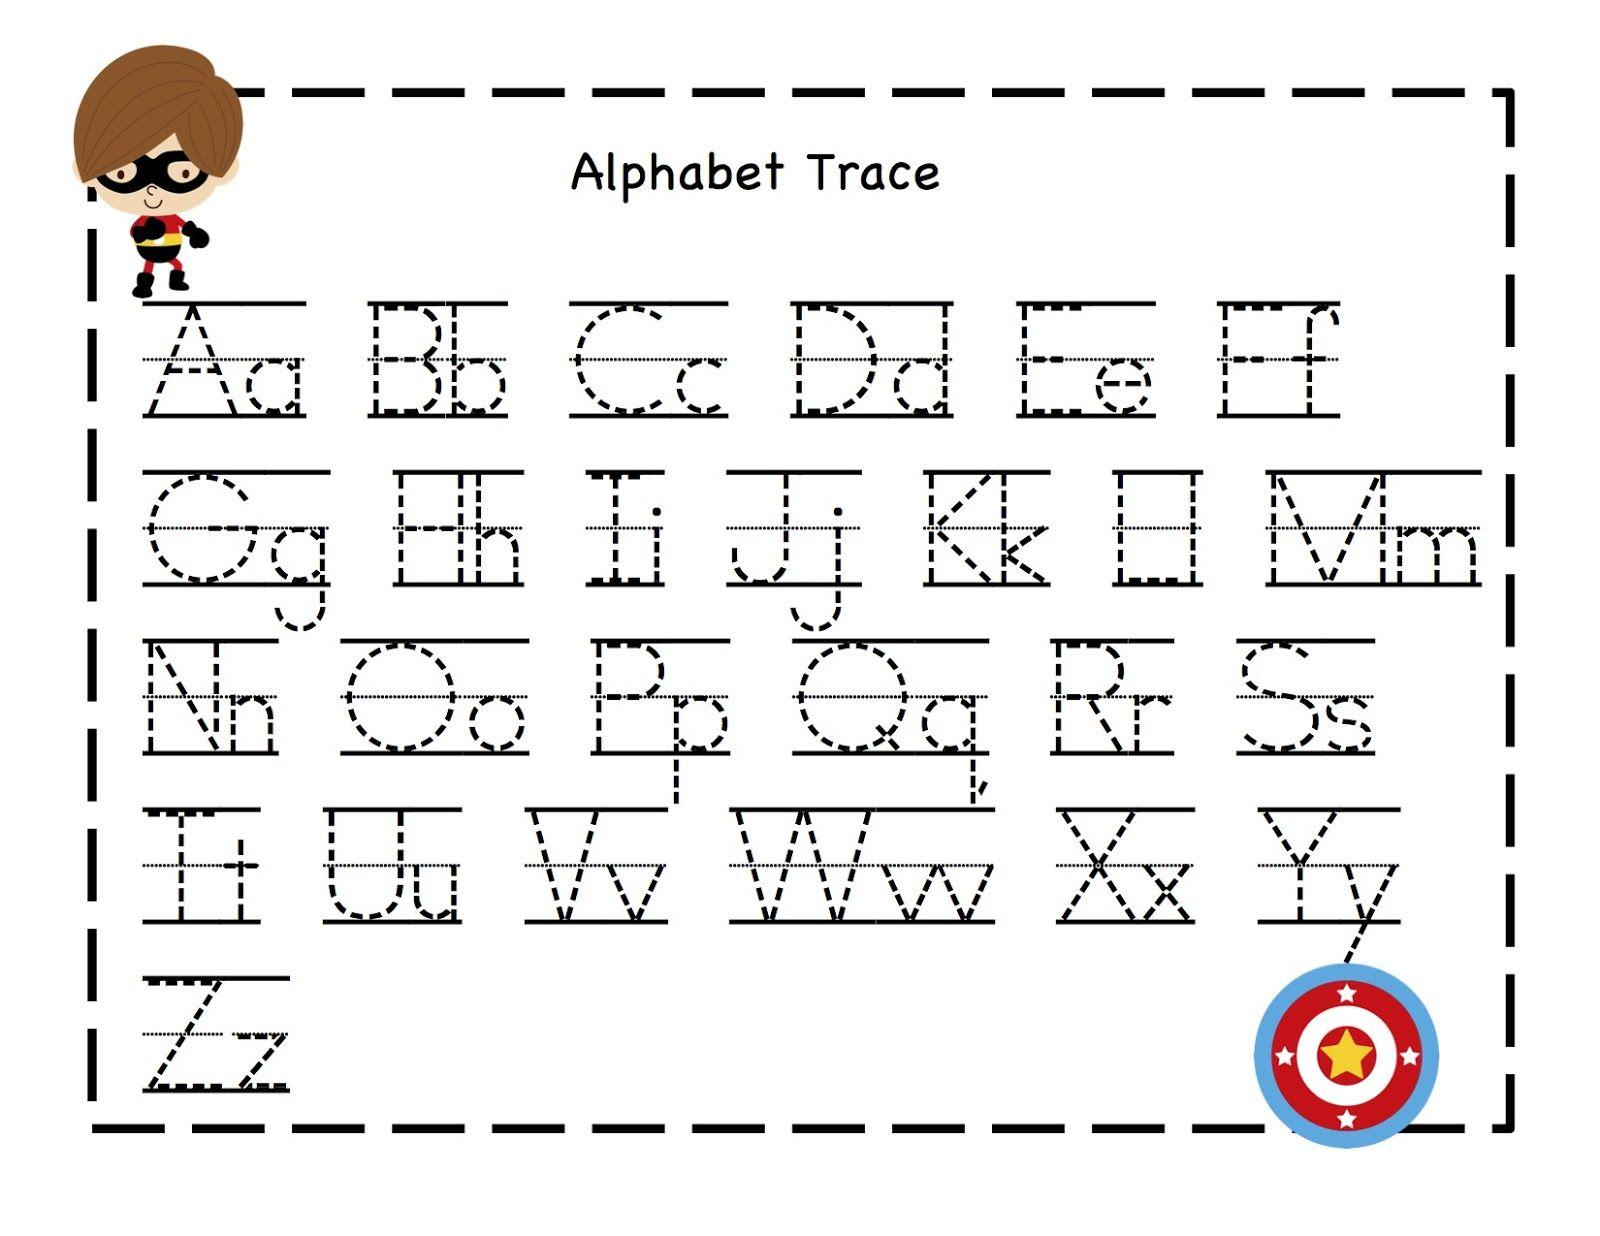 Abc Tracing Sheets For Preschool Kids   Alphabet Tracing intended for Pre-K Alphabet Tracing Pages